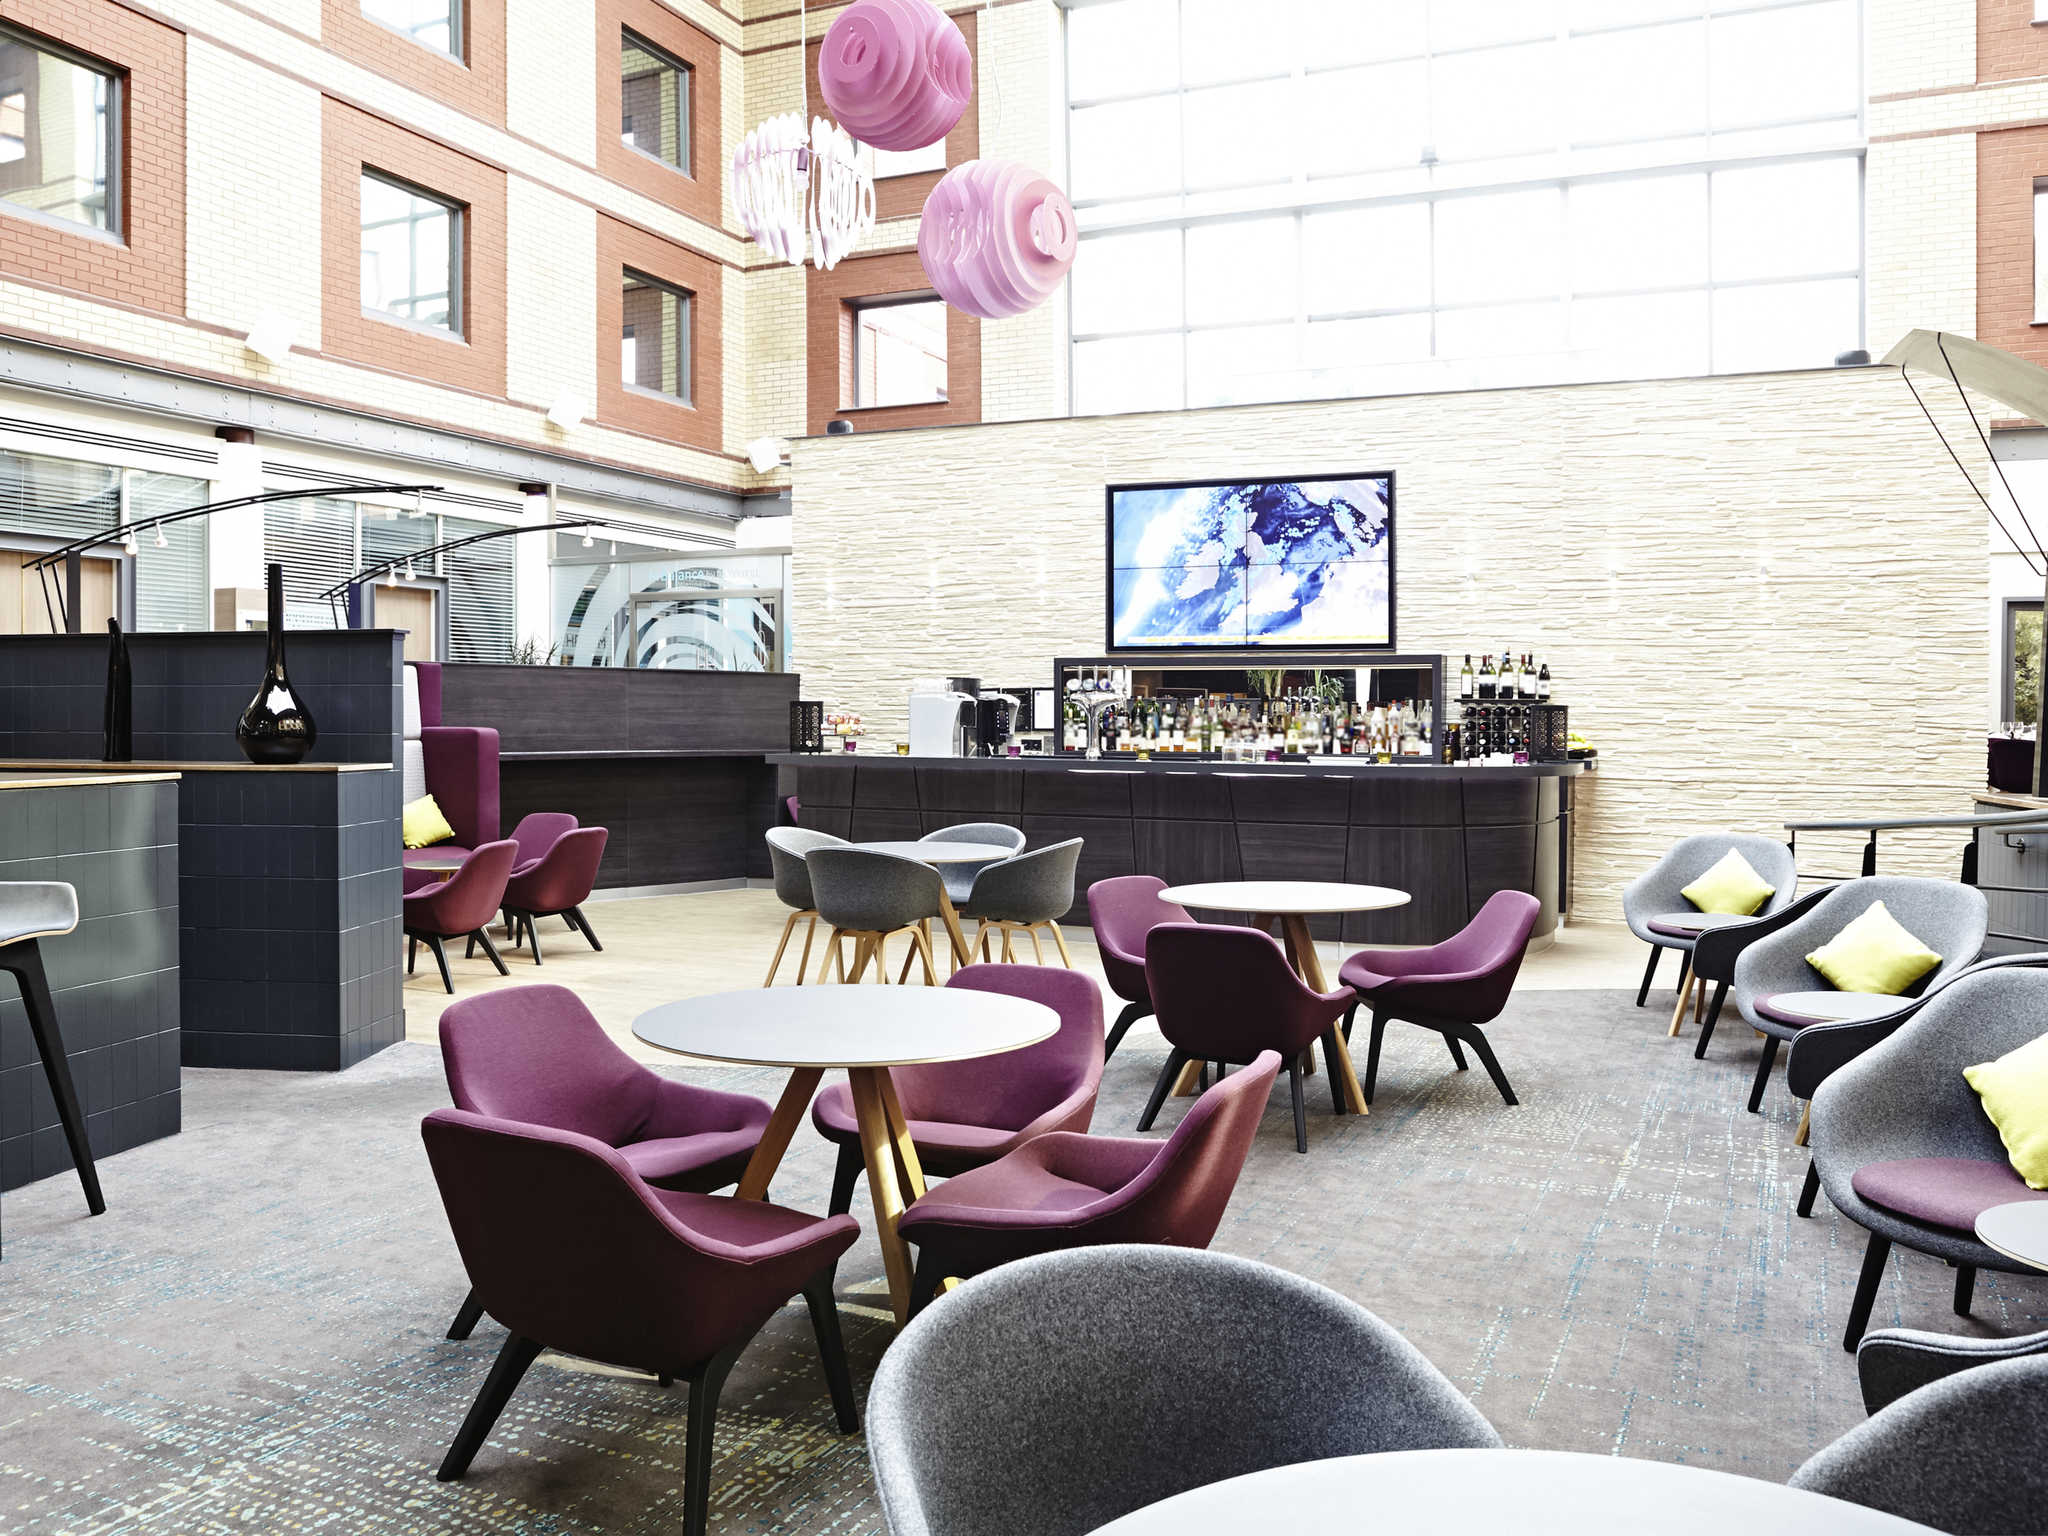 Otel – Novotel London Heathrow Airport - M4 Jct 4